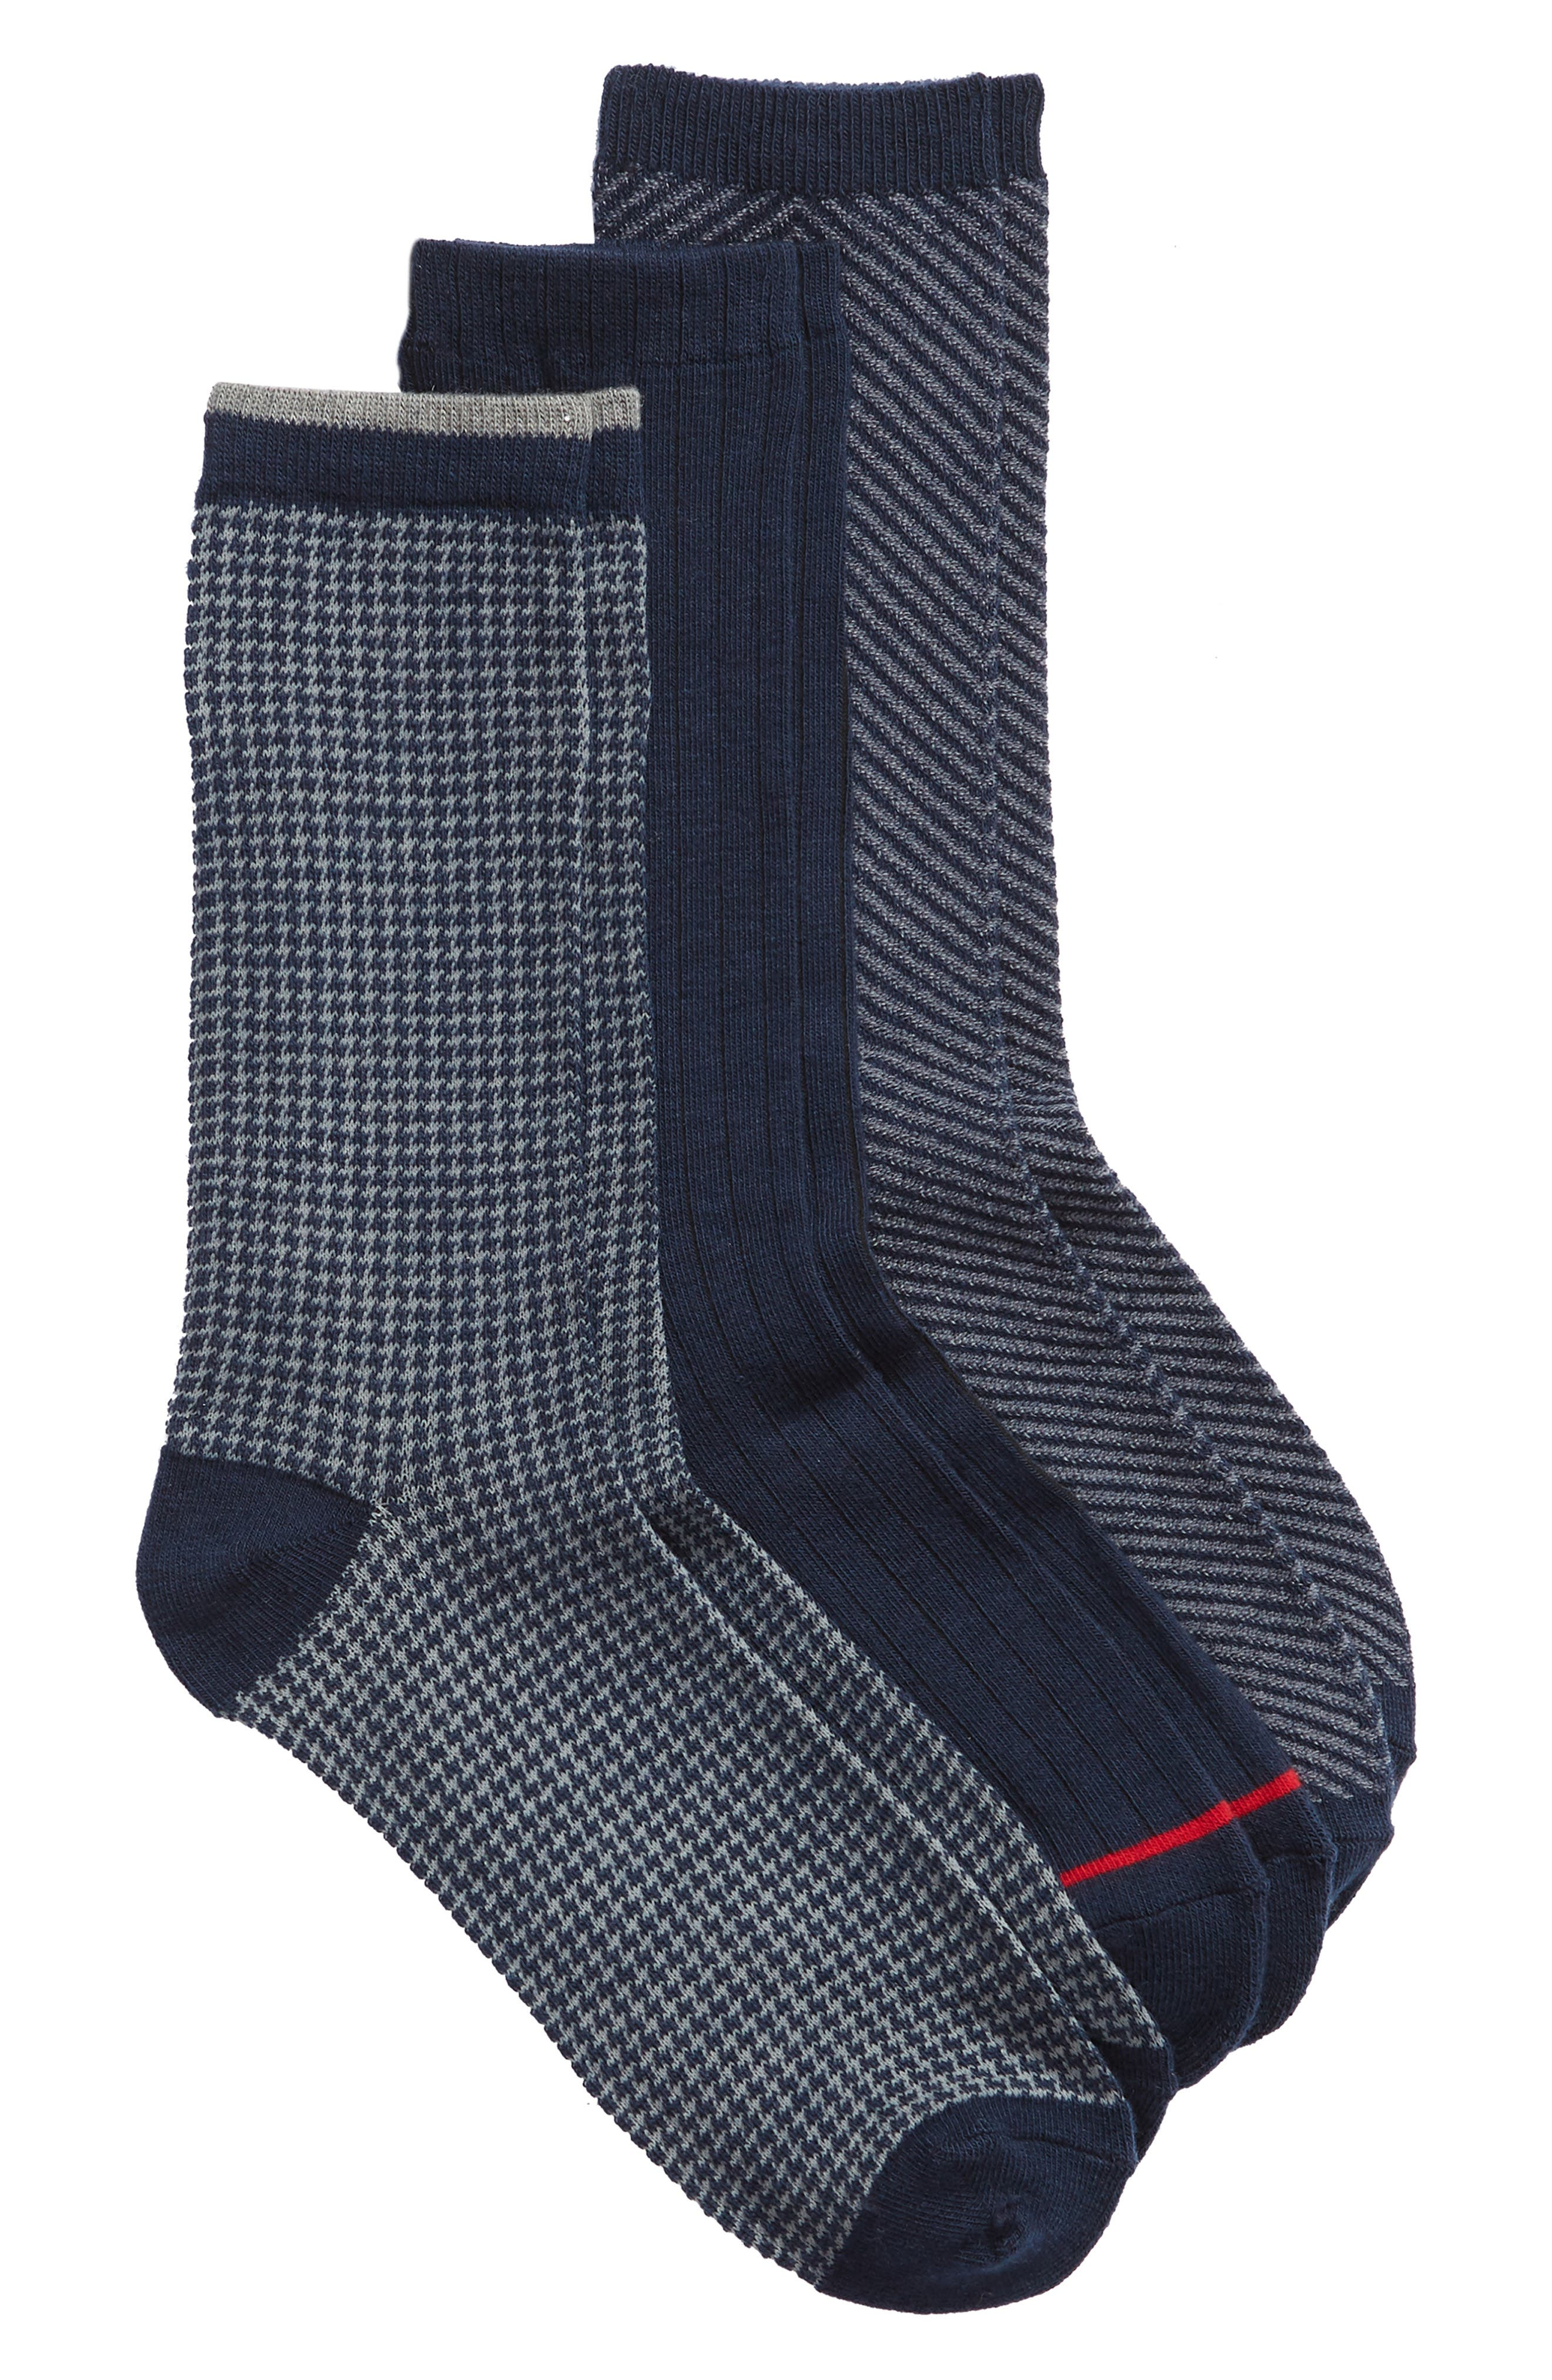 Dominic 3-Pack Crew Socks, Main, color, NAVY MULTI